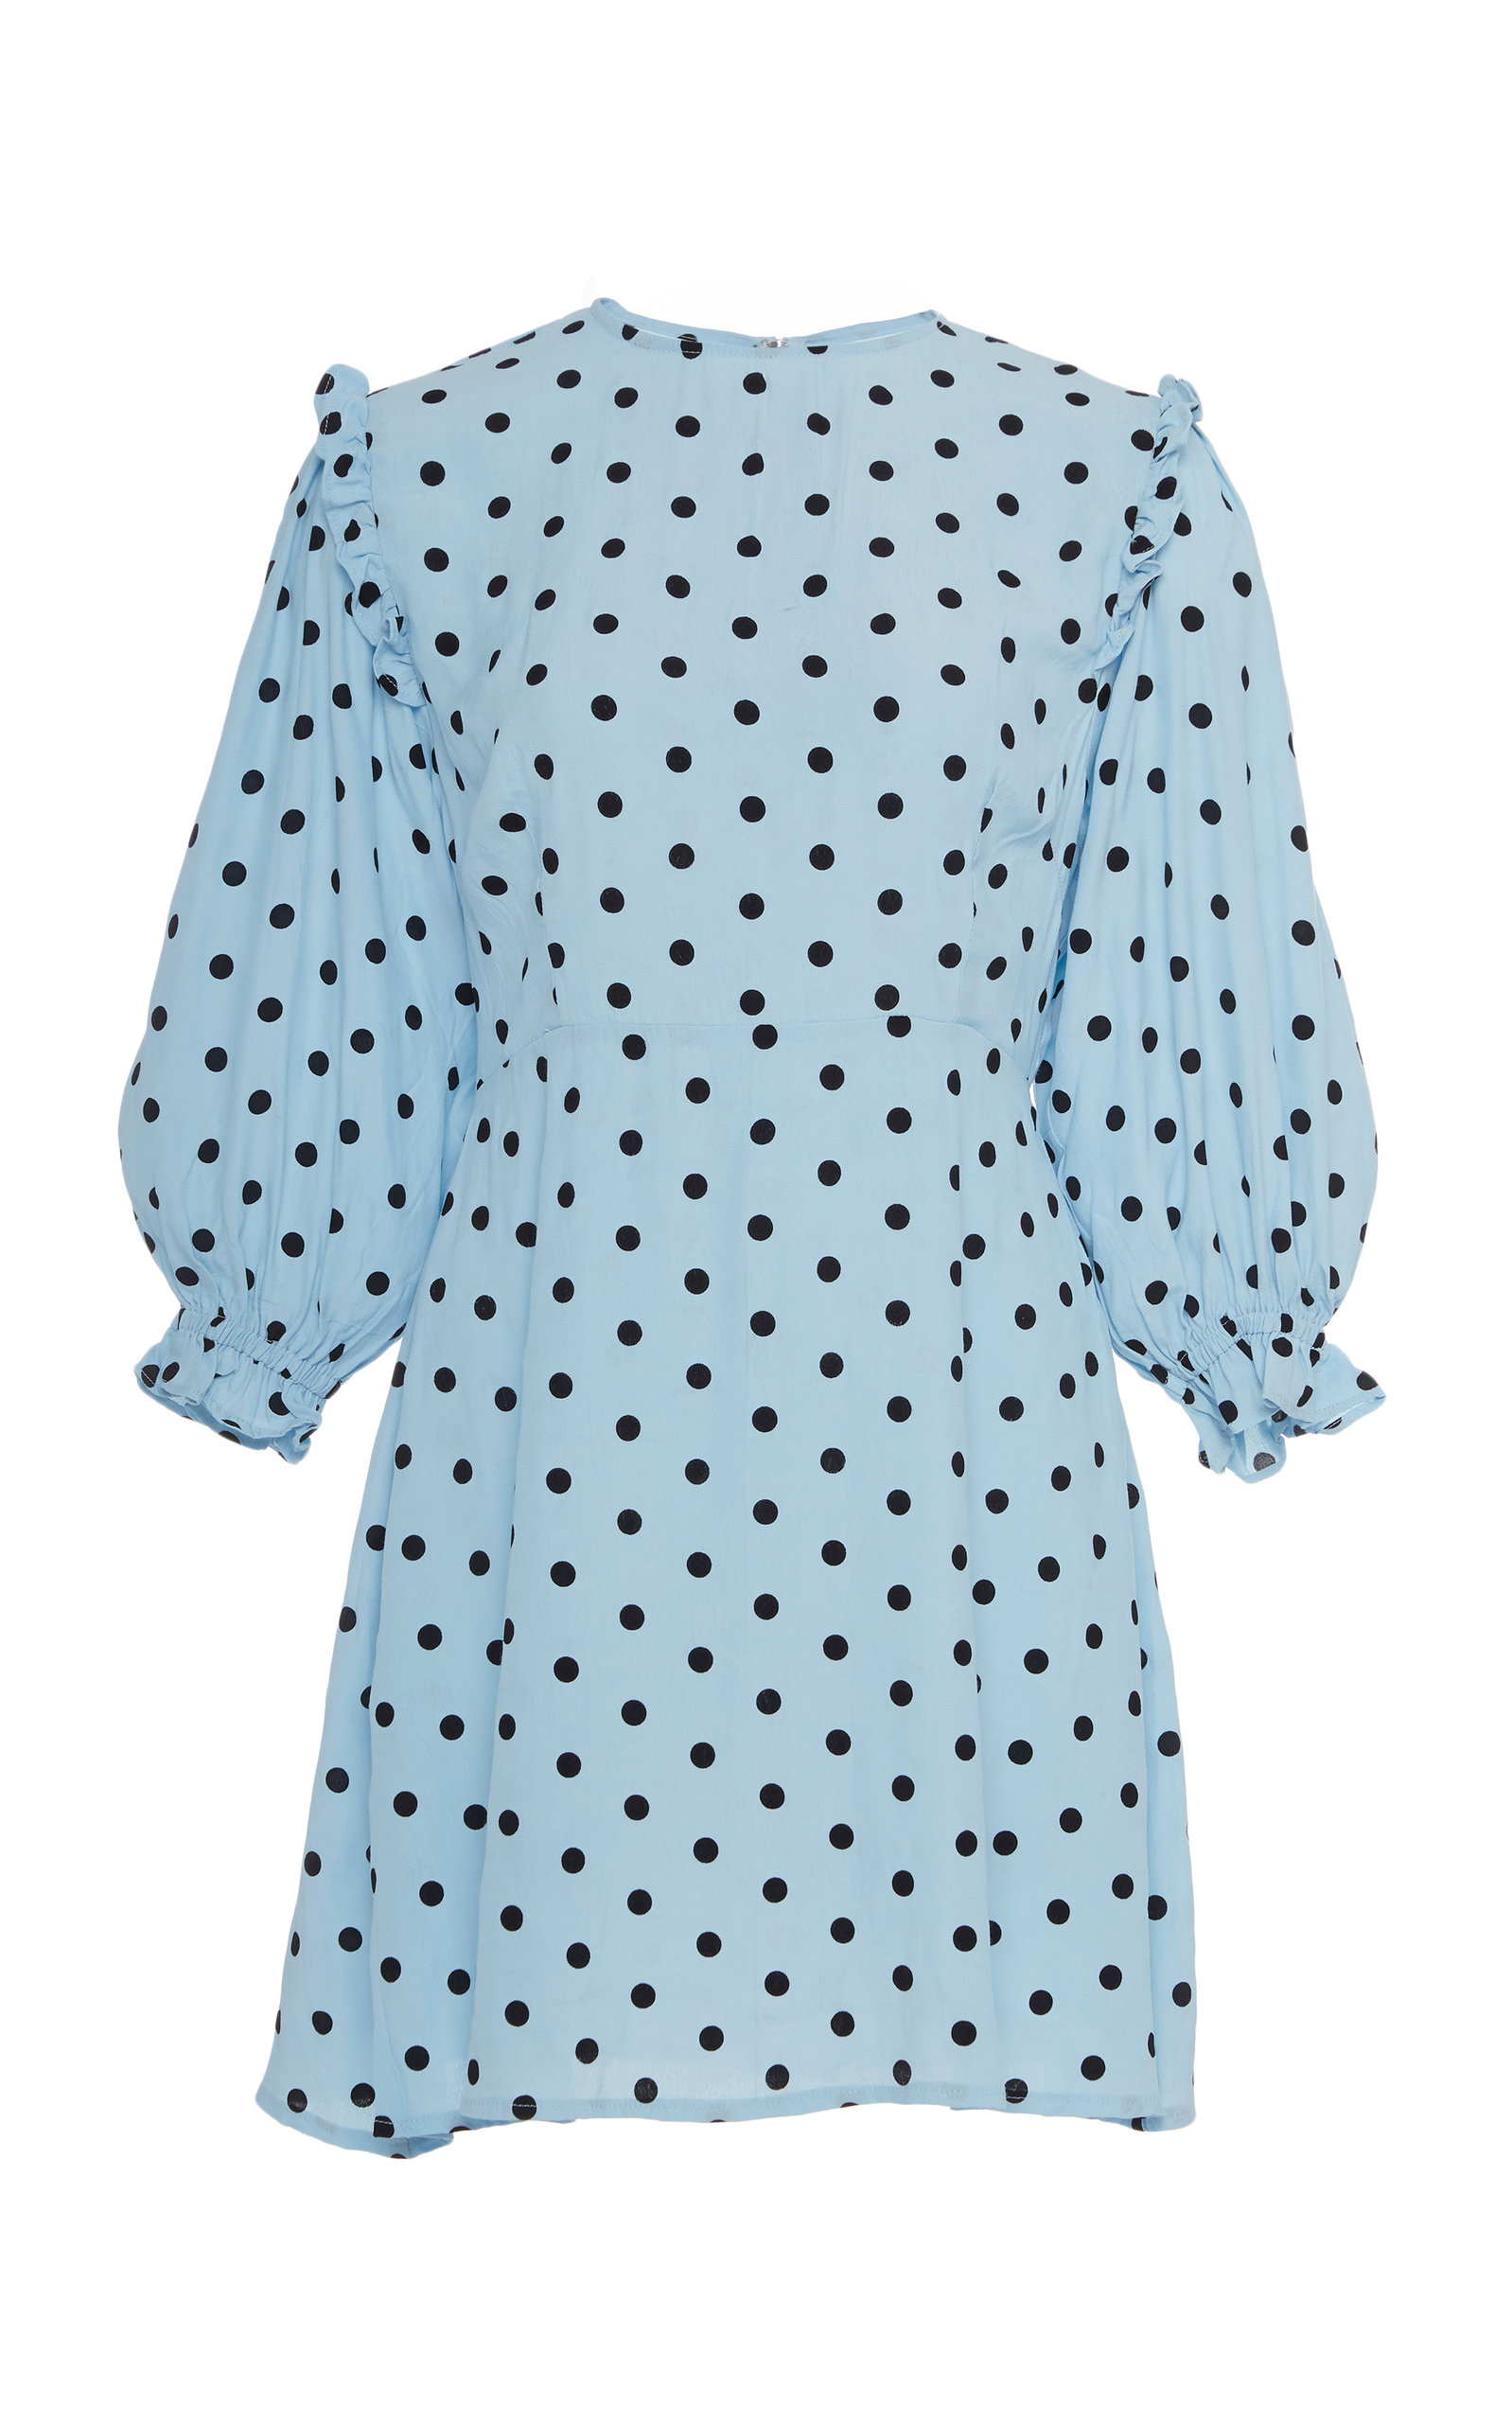 Buy Faithfull The Brand Edwina Polka Dot Print Dress online, shop Faithfull The Brand at the best price